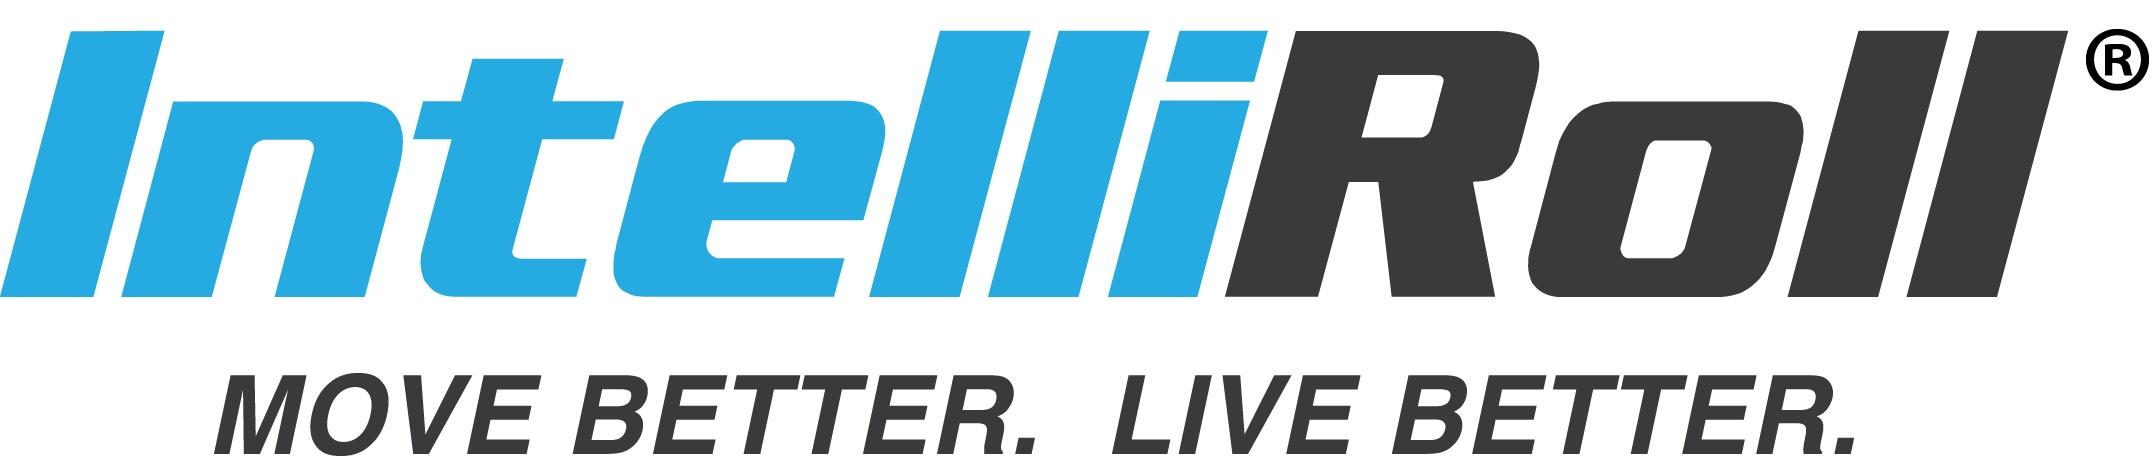 new-logo-tag.jpg